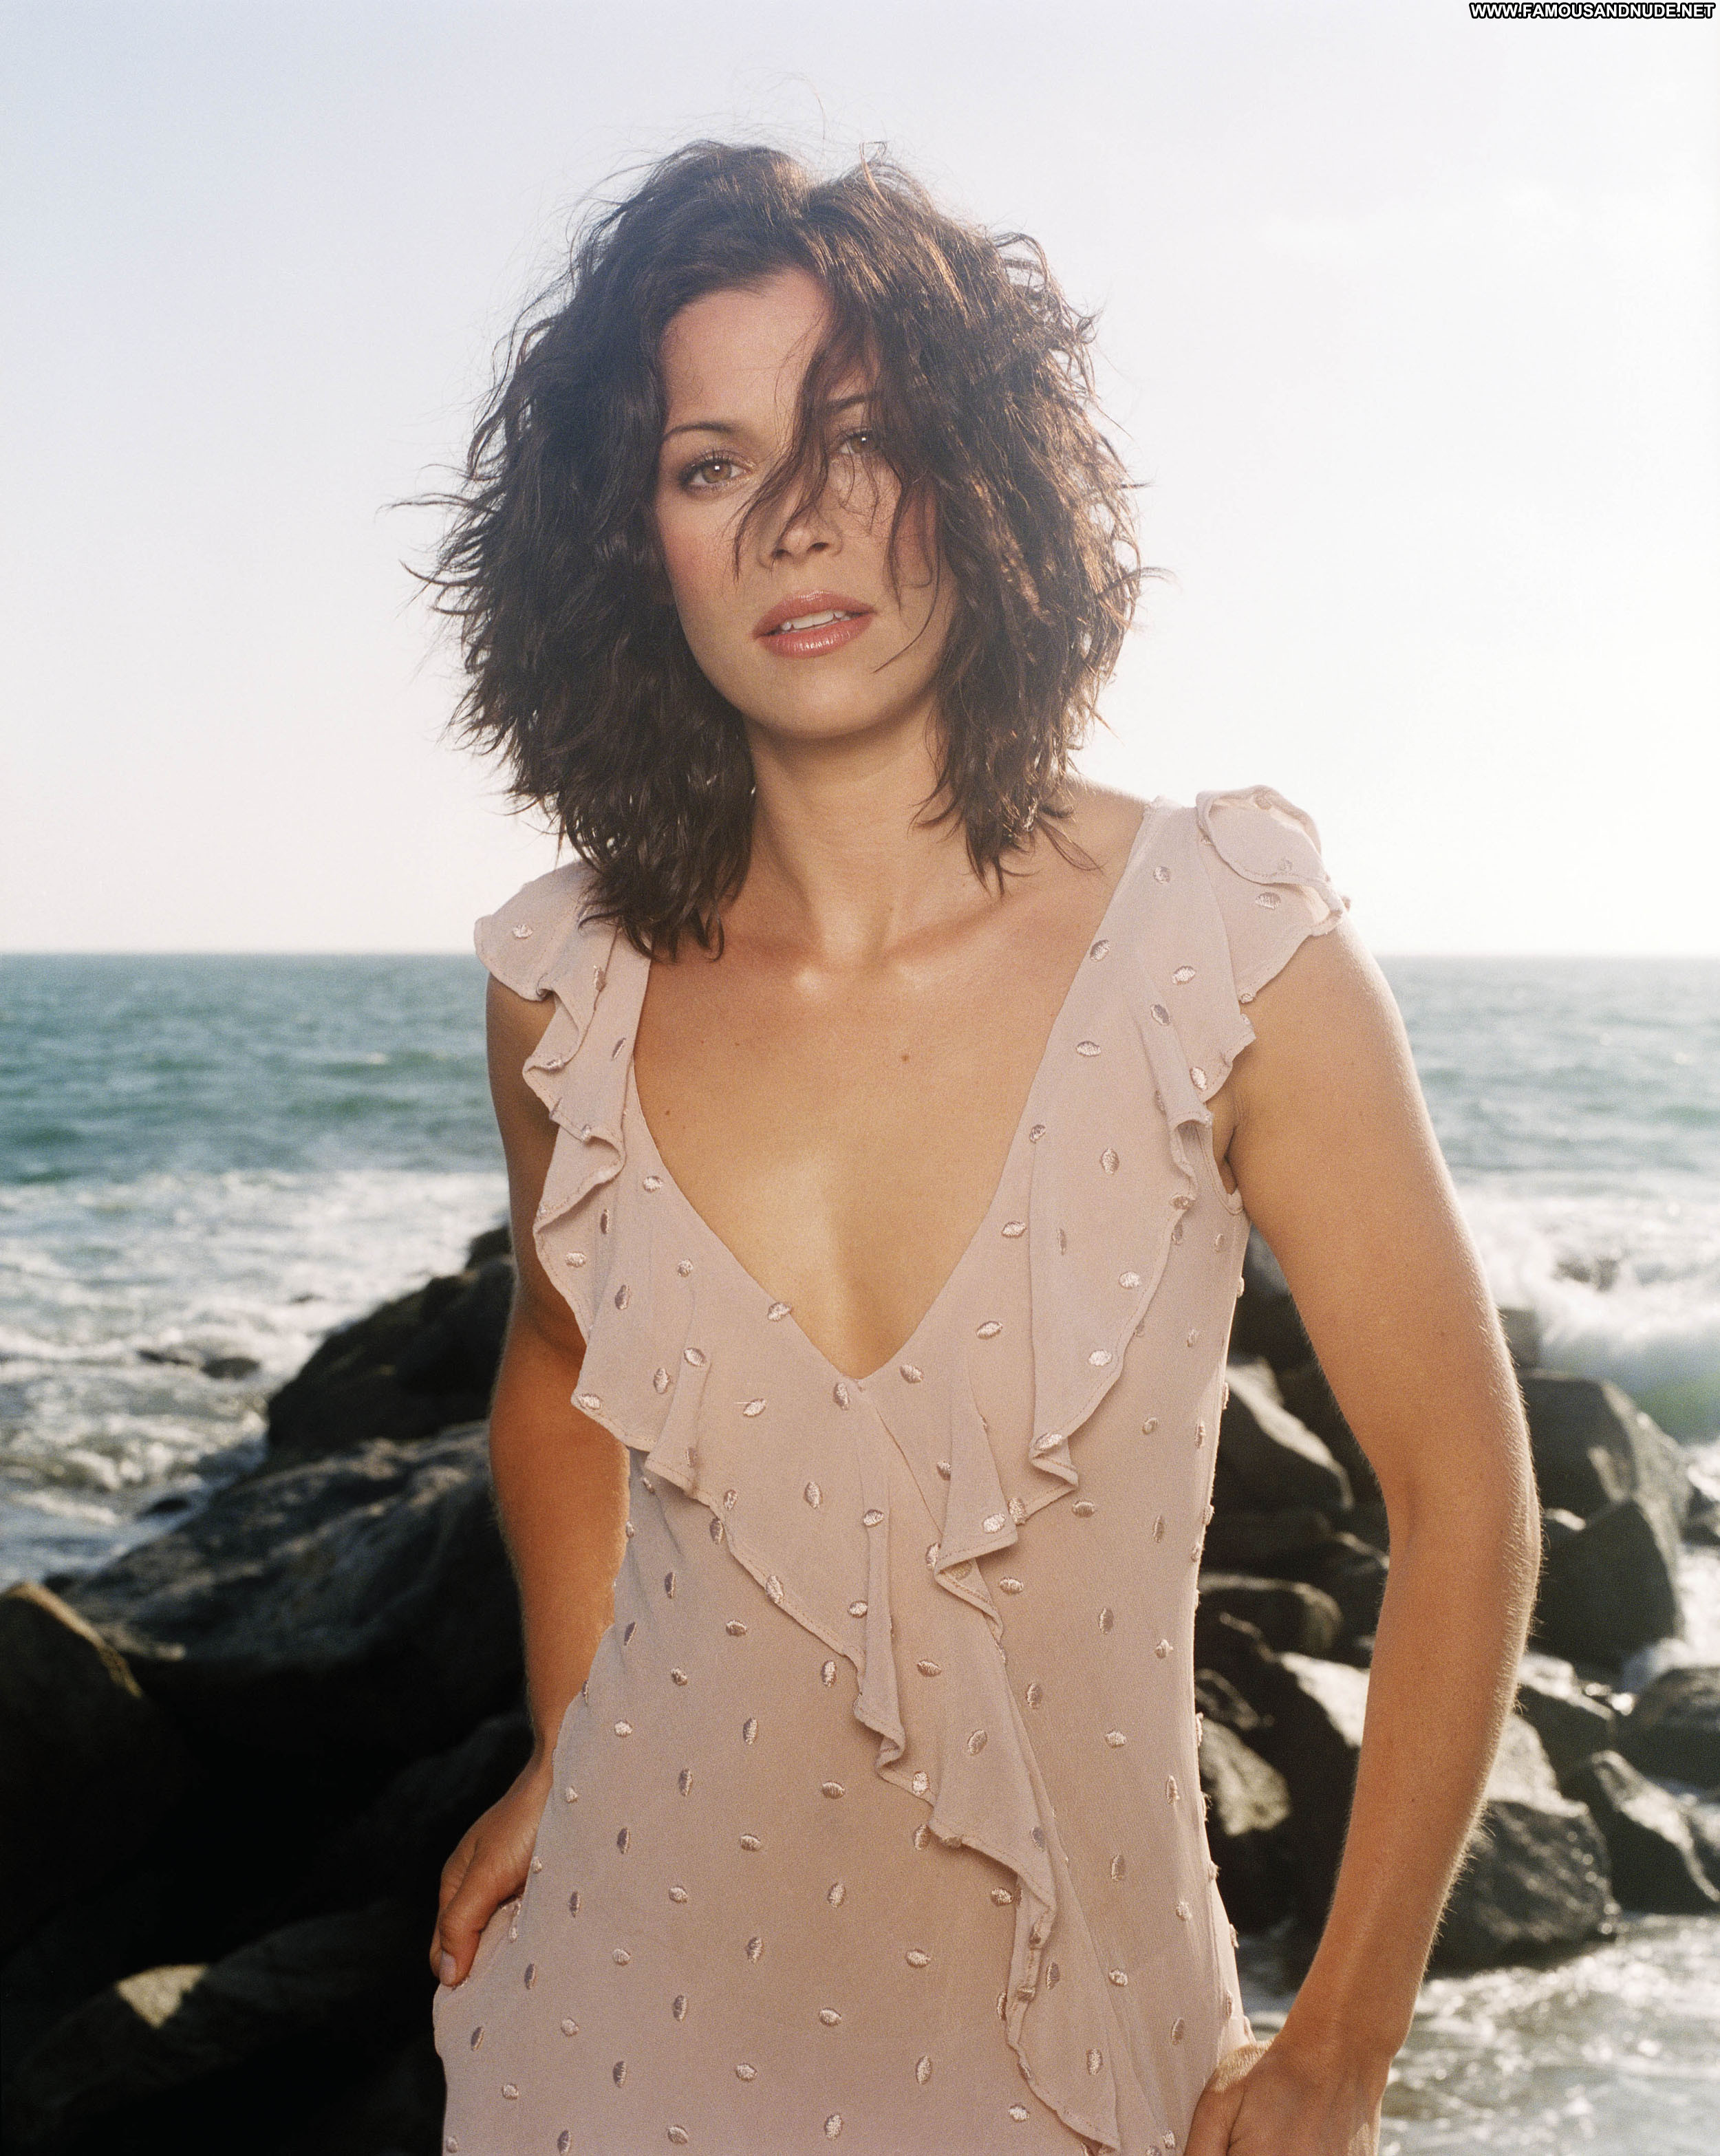 Brooke Langton No Source Celebrity Beautiful Babe Posing Hot